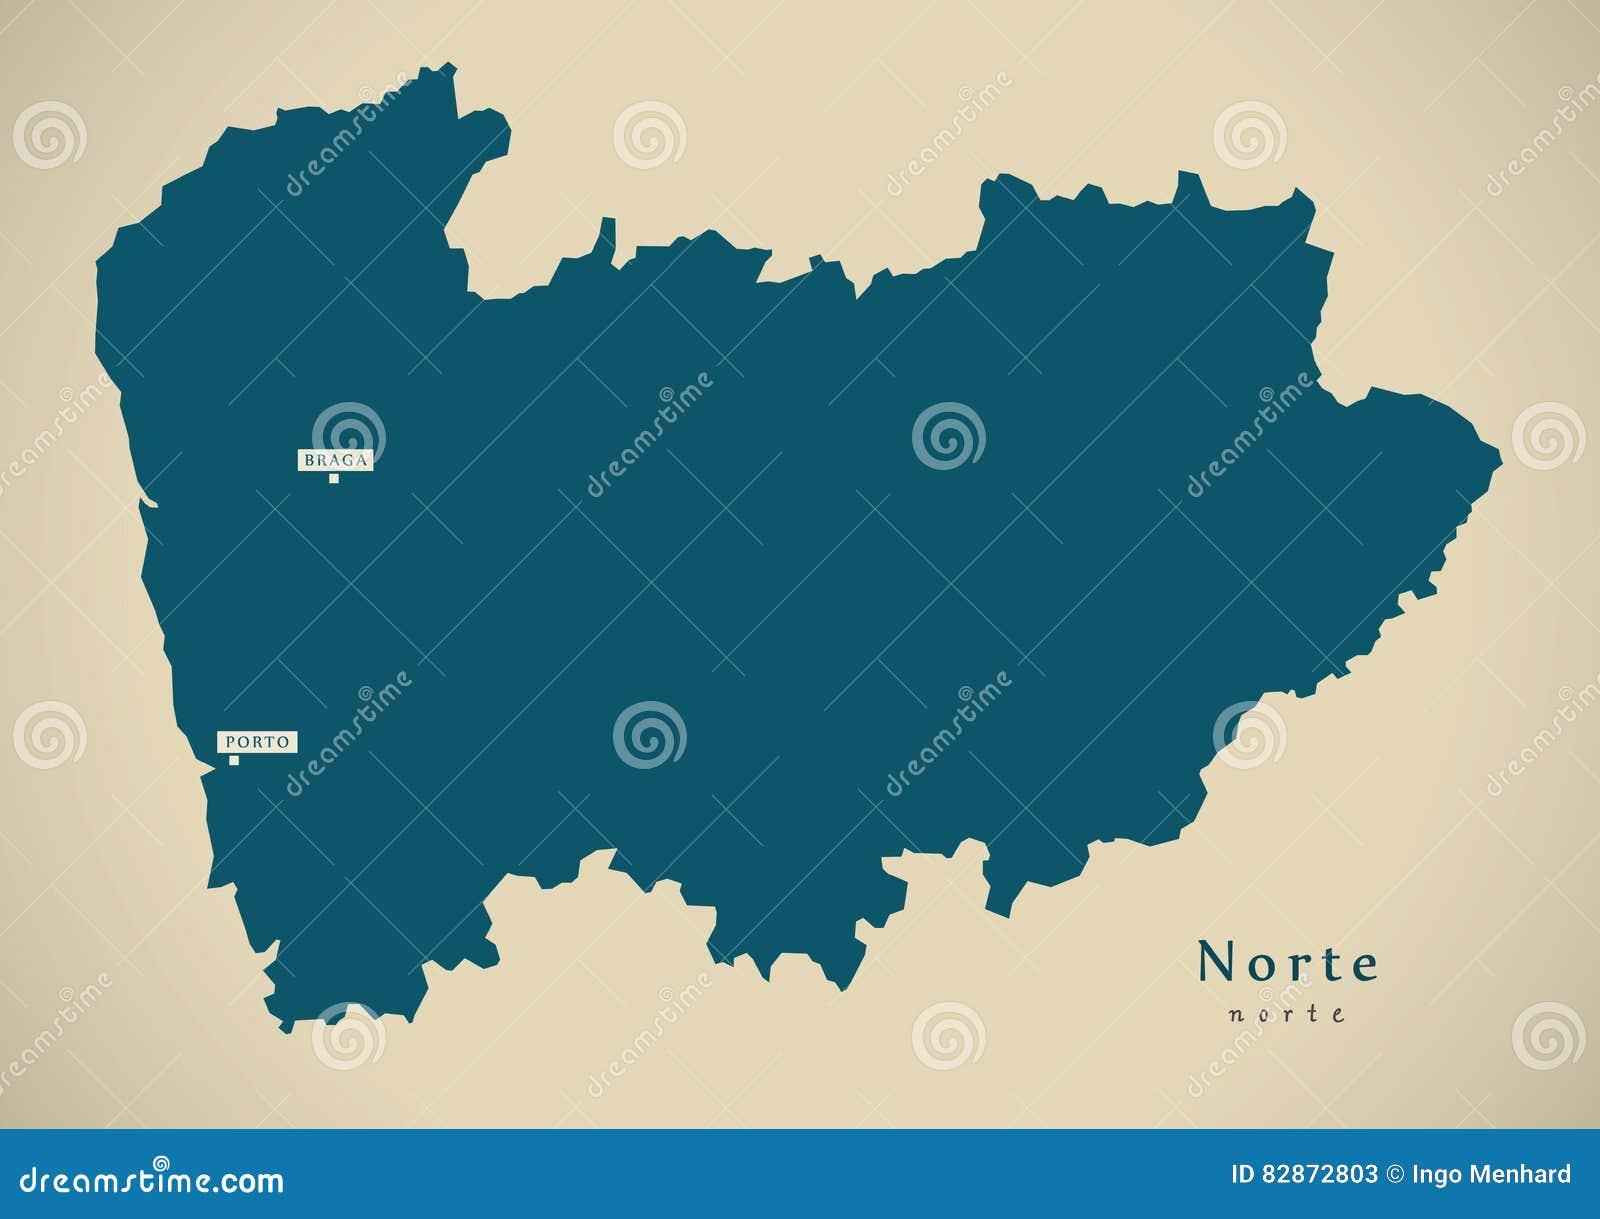 Mapa Moderno Norte Portugal Pinta Ilustracao Stock Ilustracao